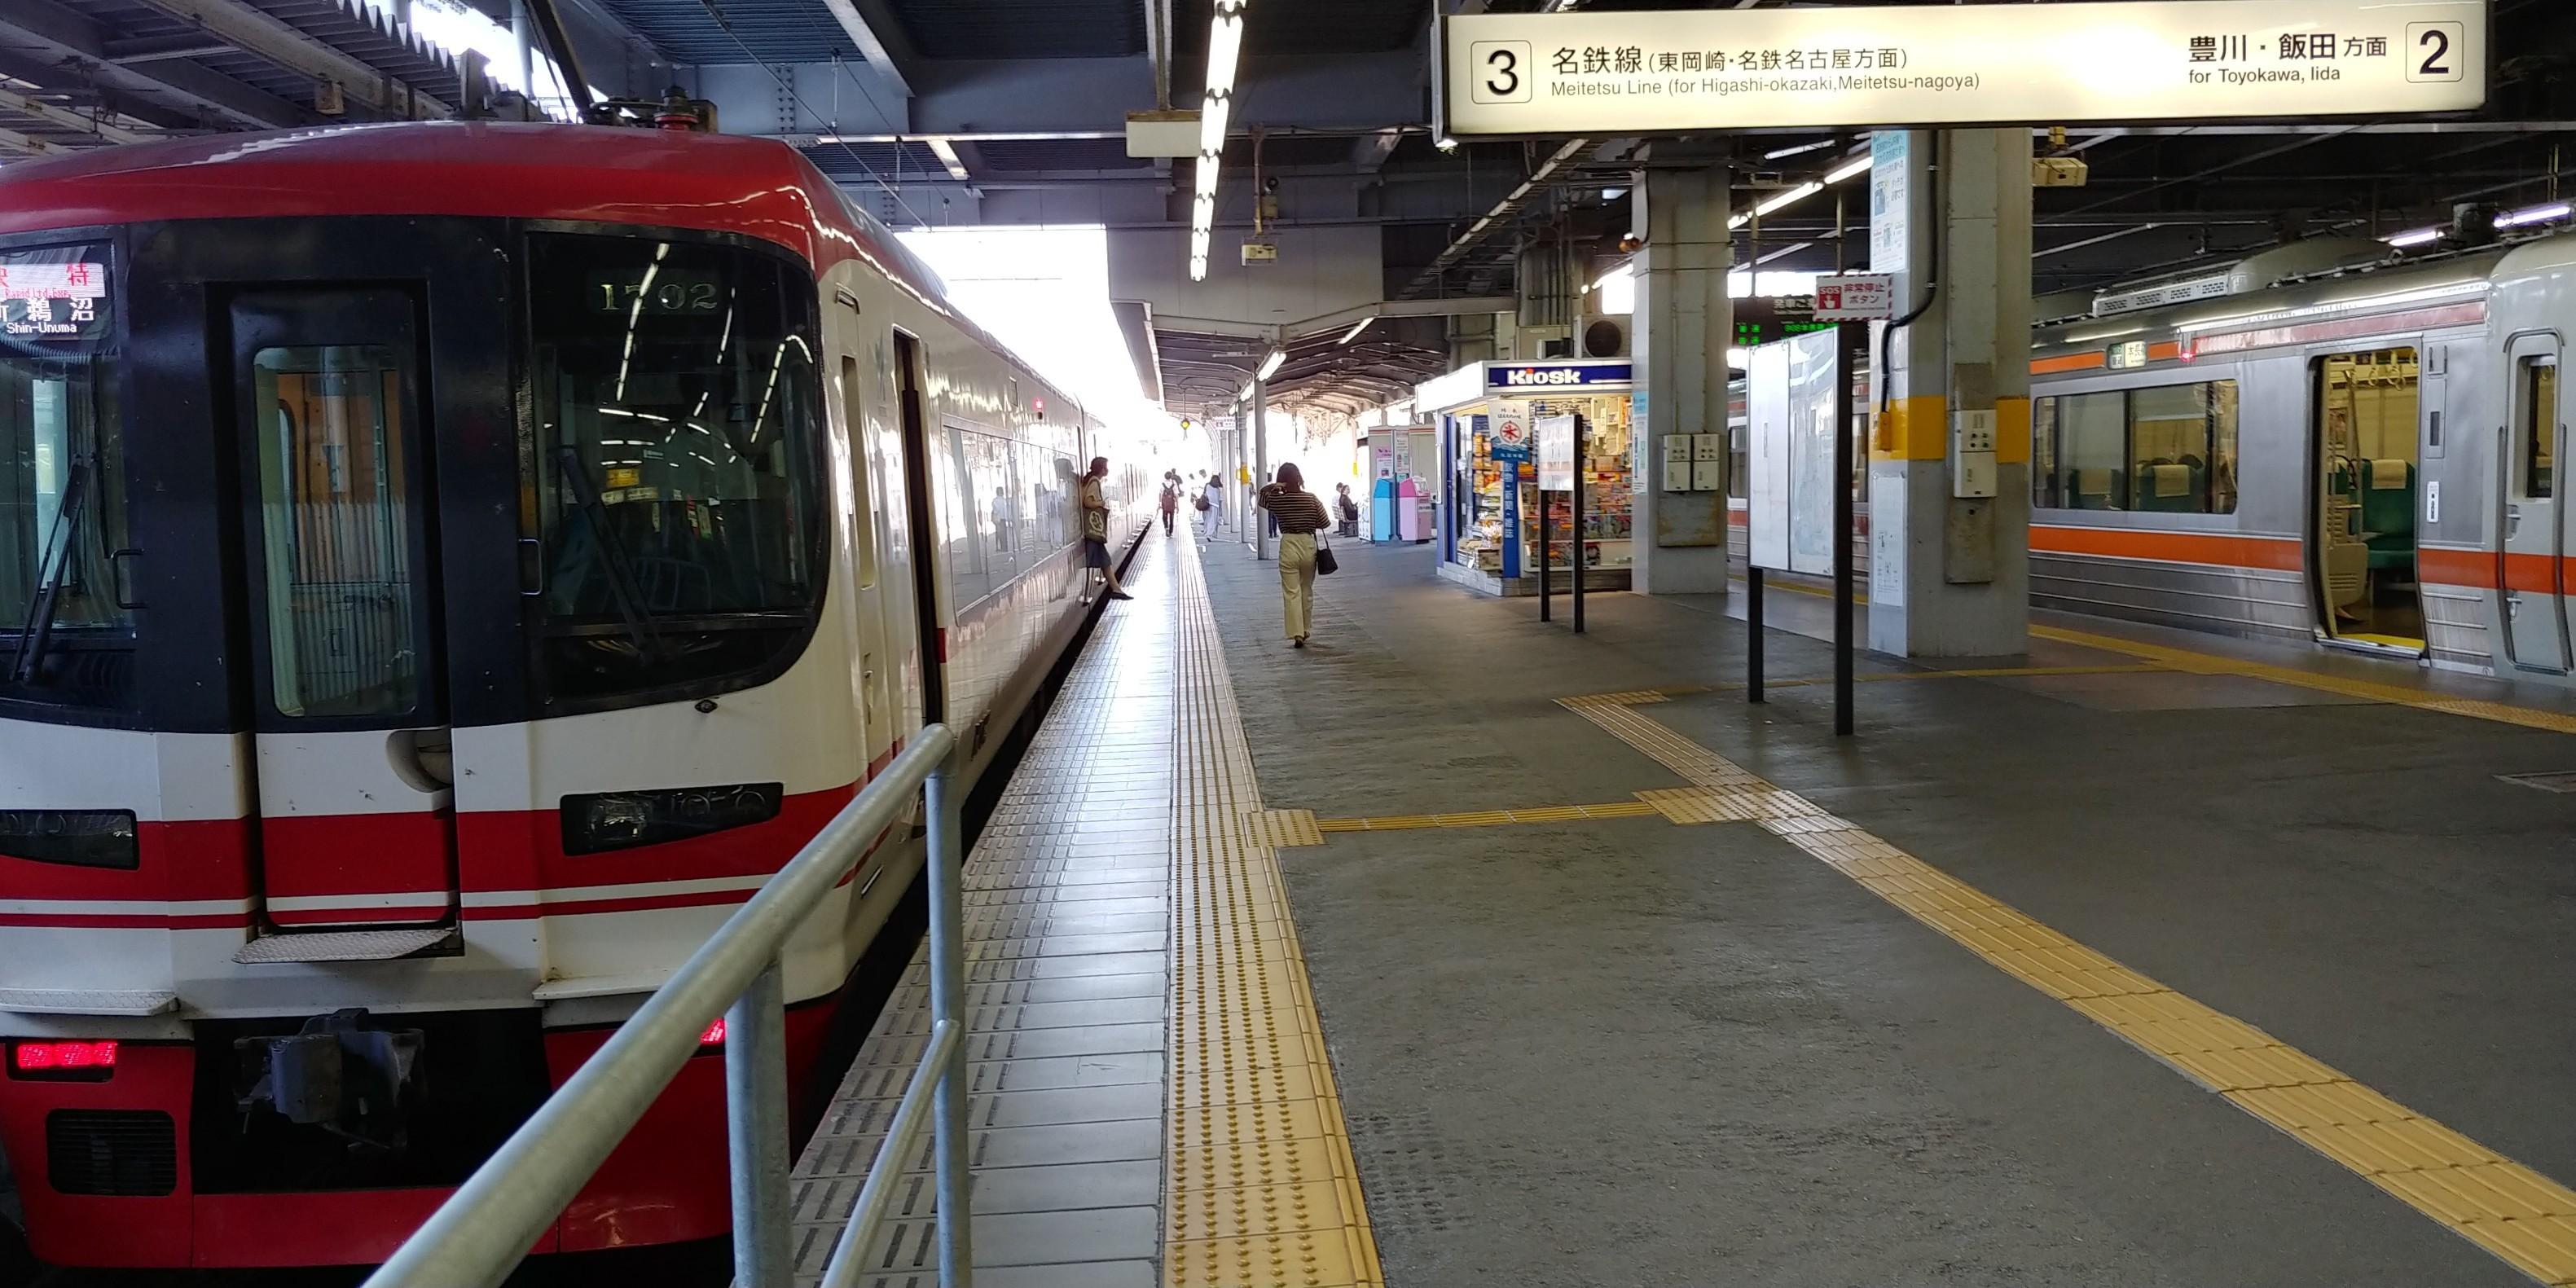 f:id:kishuji-kaisoku:20200118135706j:image